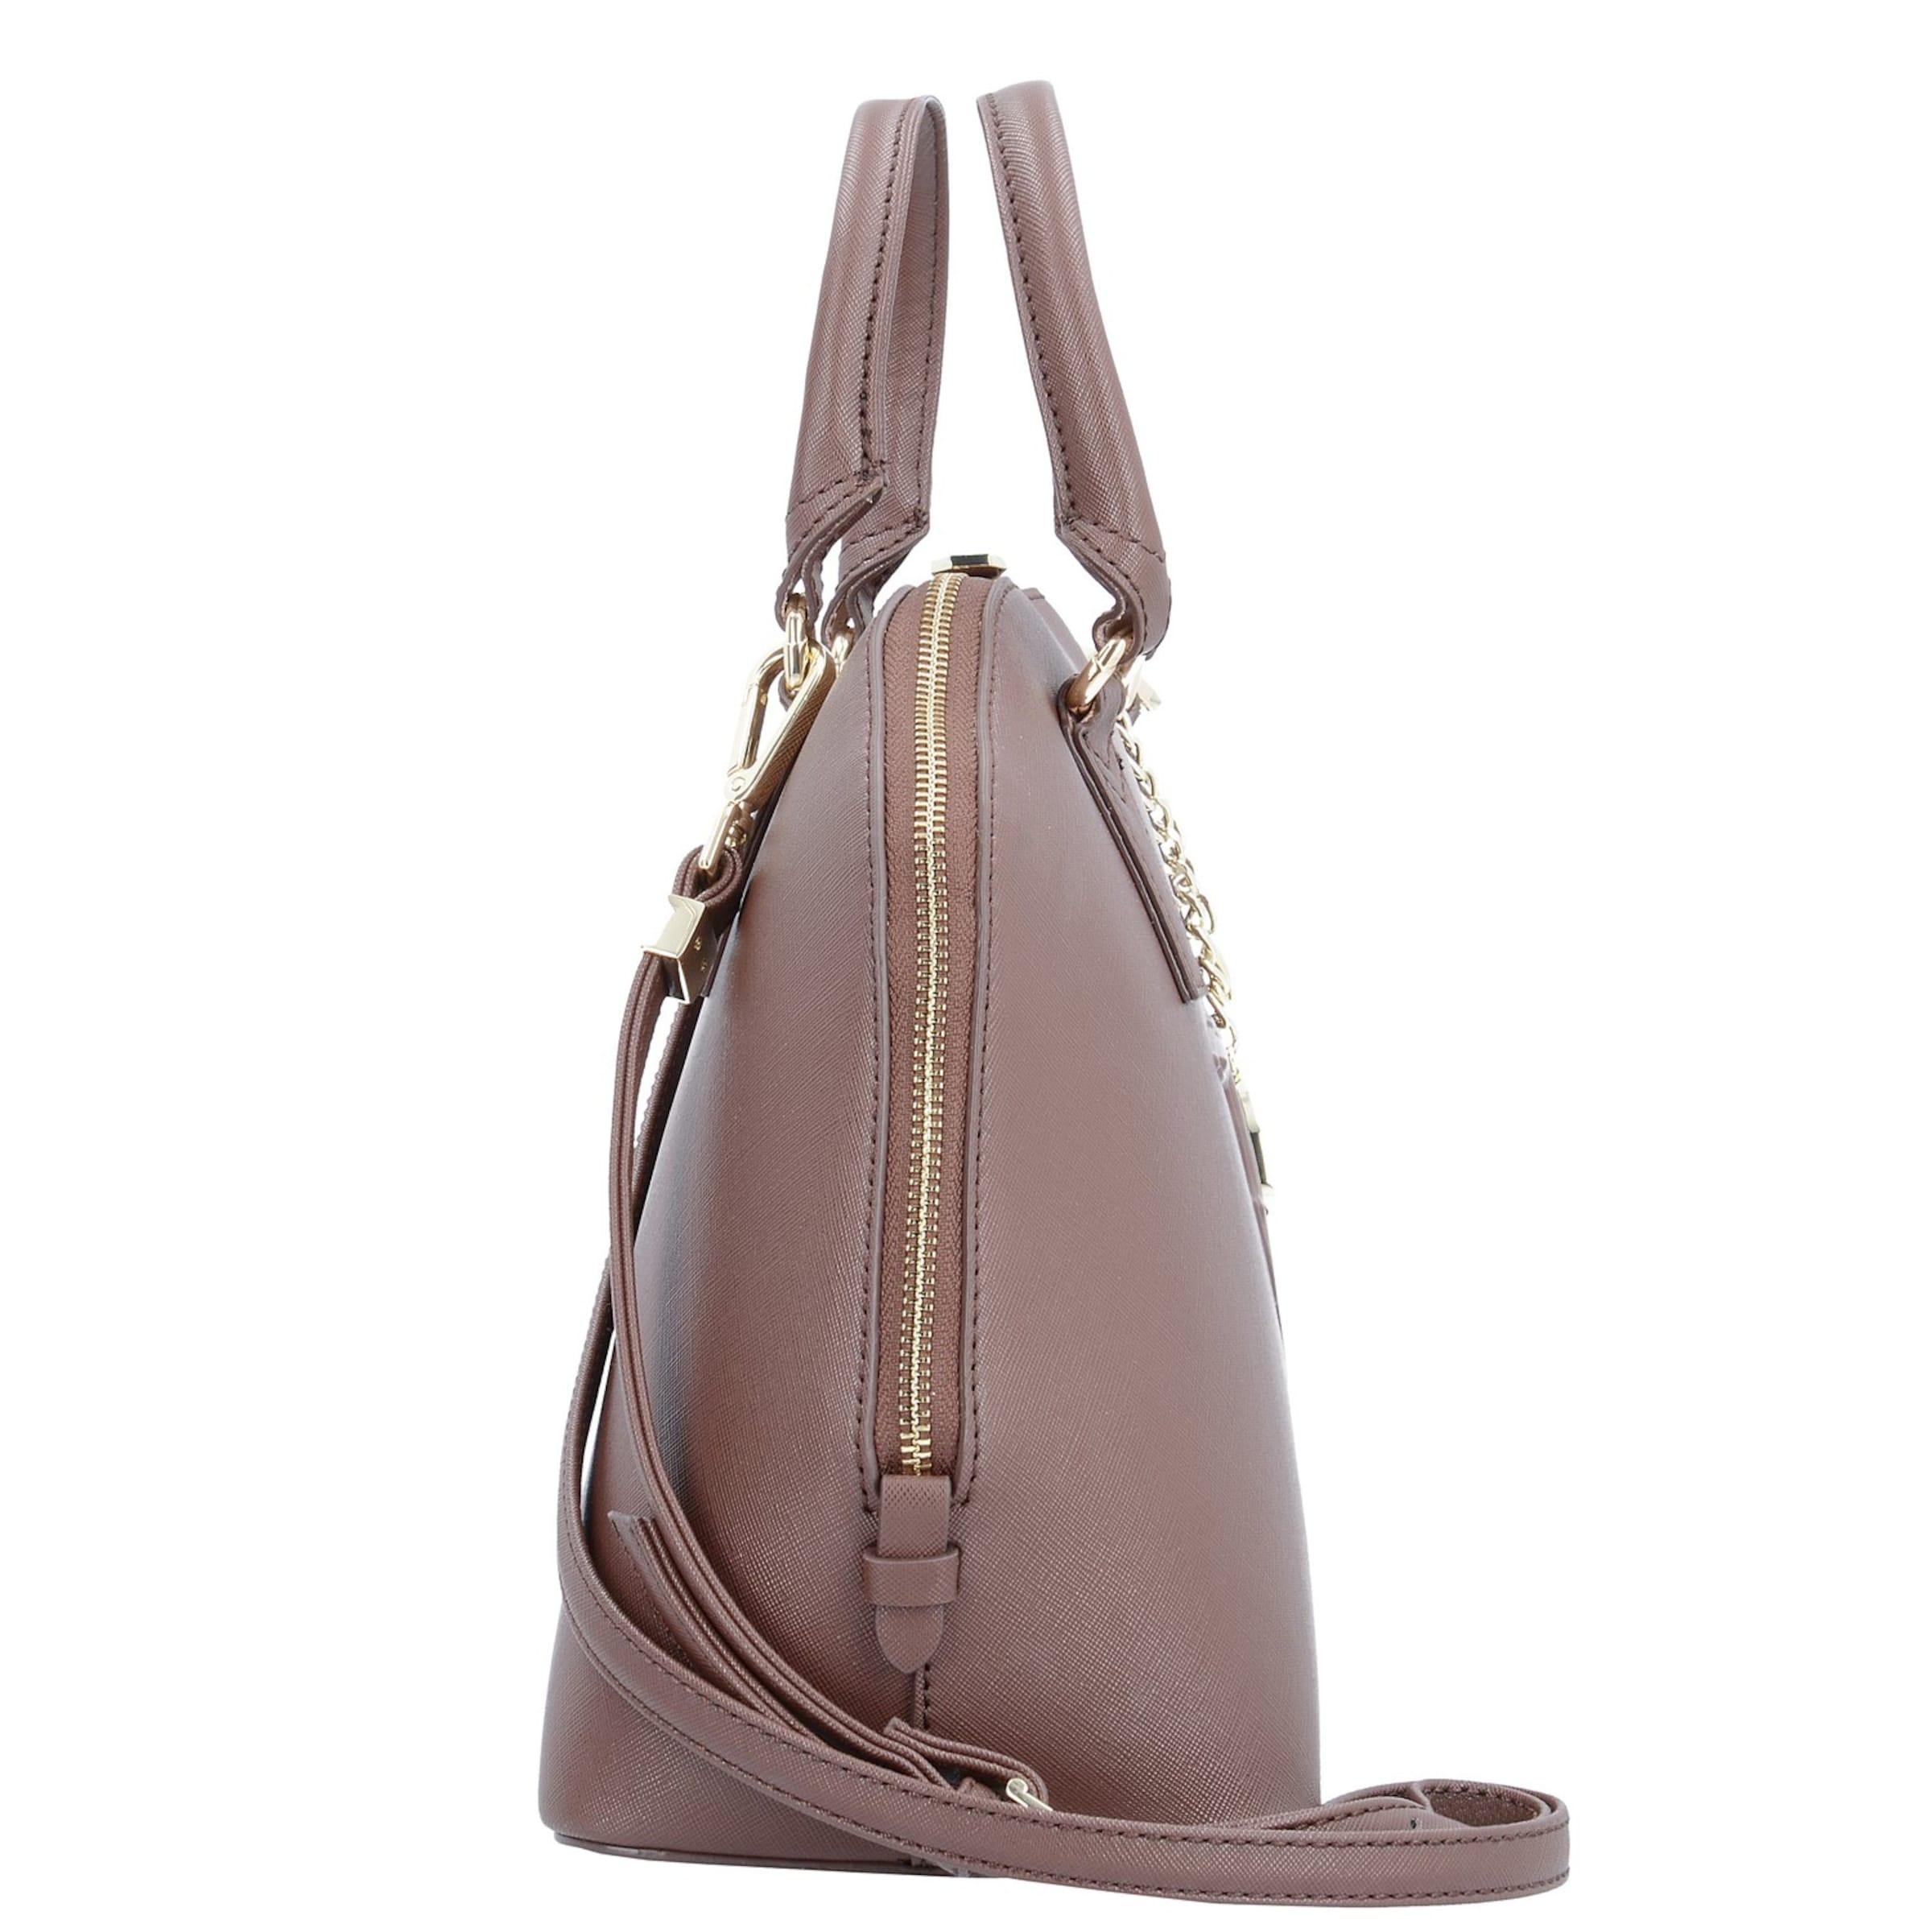 Trussardi Dome Ecoleather Trussardi Ischia Ischia Ecoleather cm Jeans Handtasche Bag Jeans 32 tww0fSq